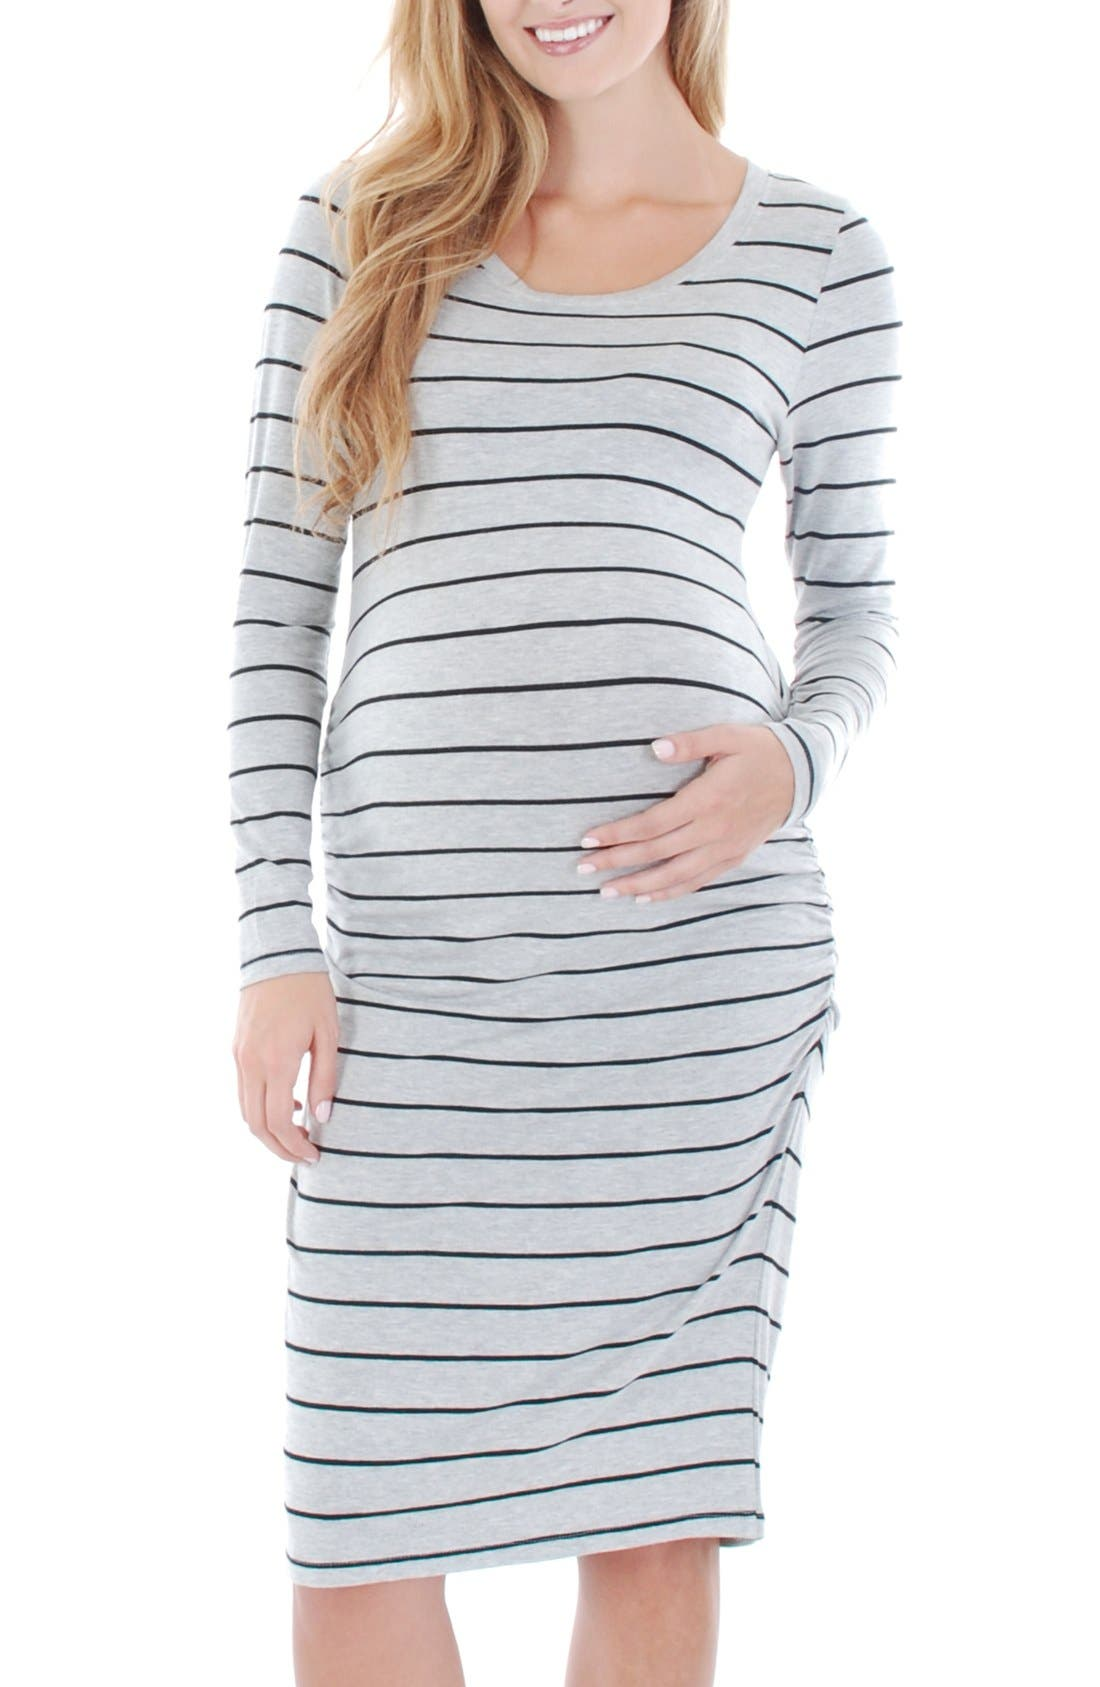 EverlyGrey 'Hanh' Maternity T-Shirt Dress,                             Main thumbnail 1, color,                             GREY STRIPE